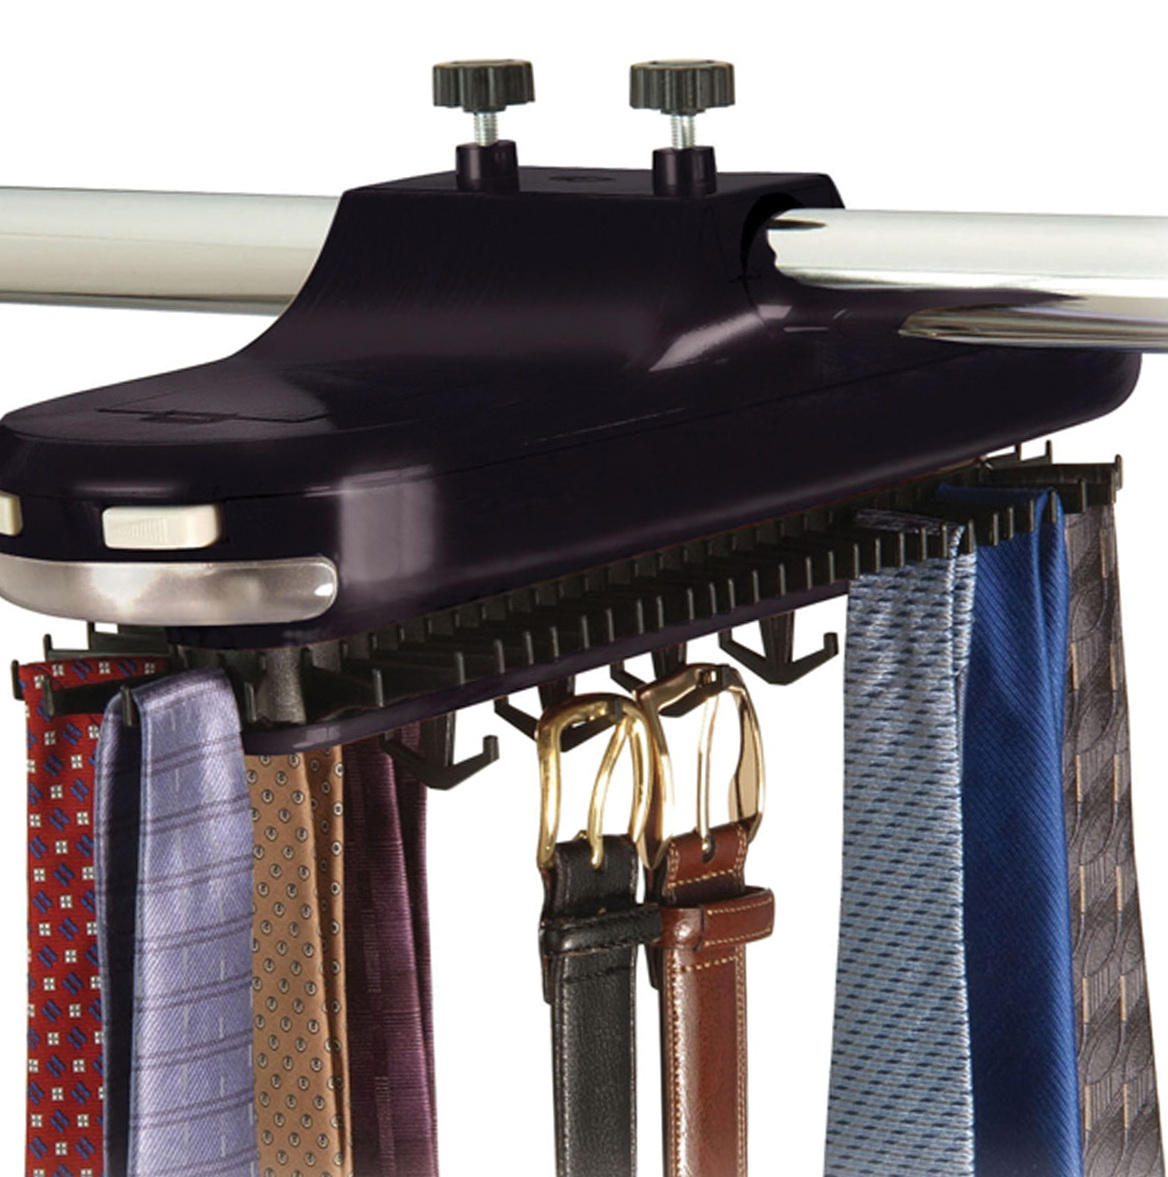 Best Tie Racks For Closets: Motorized Tie Racks For Closets